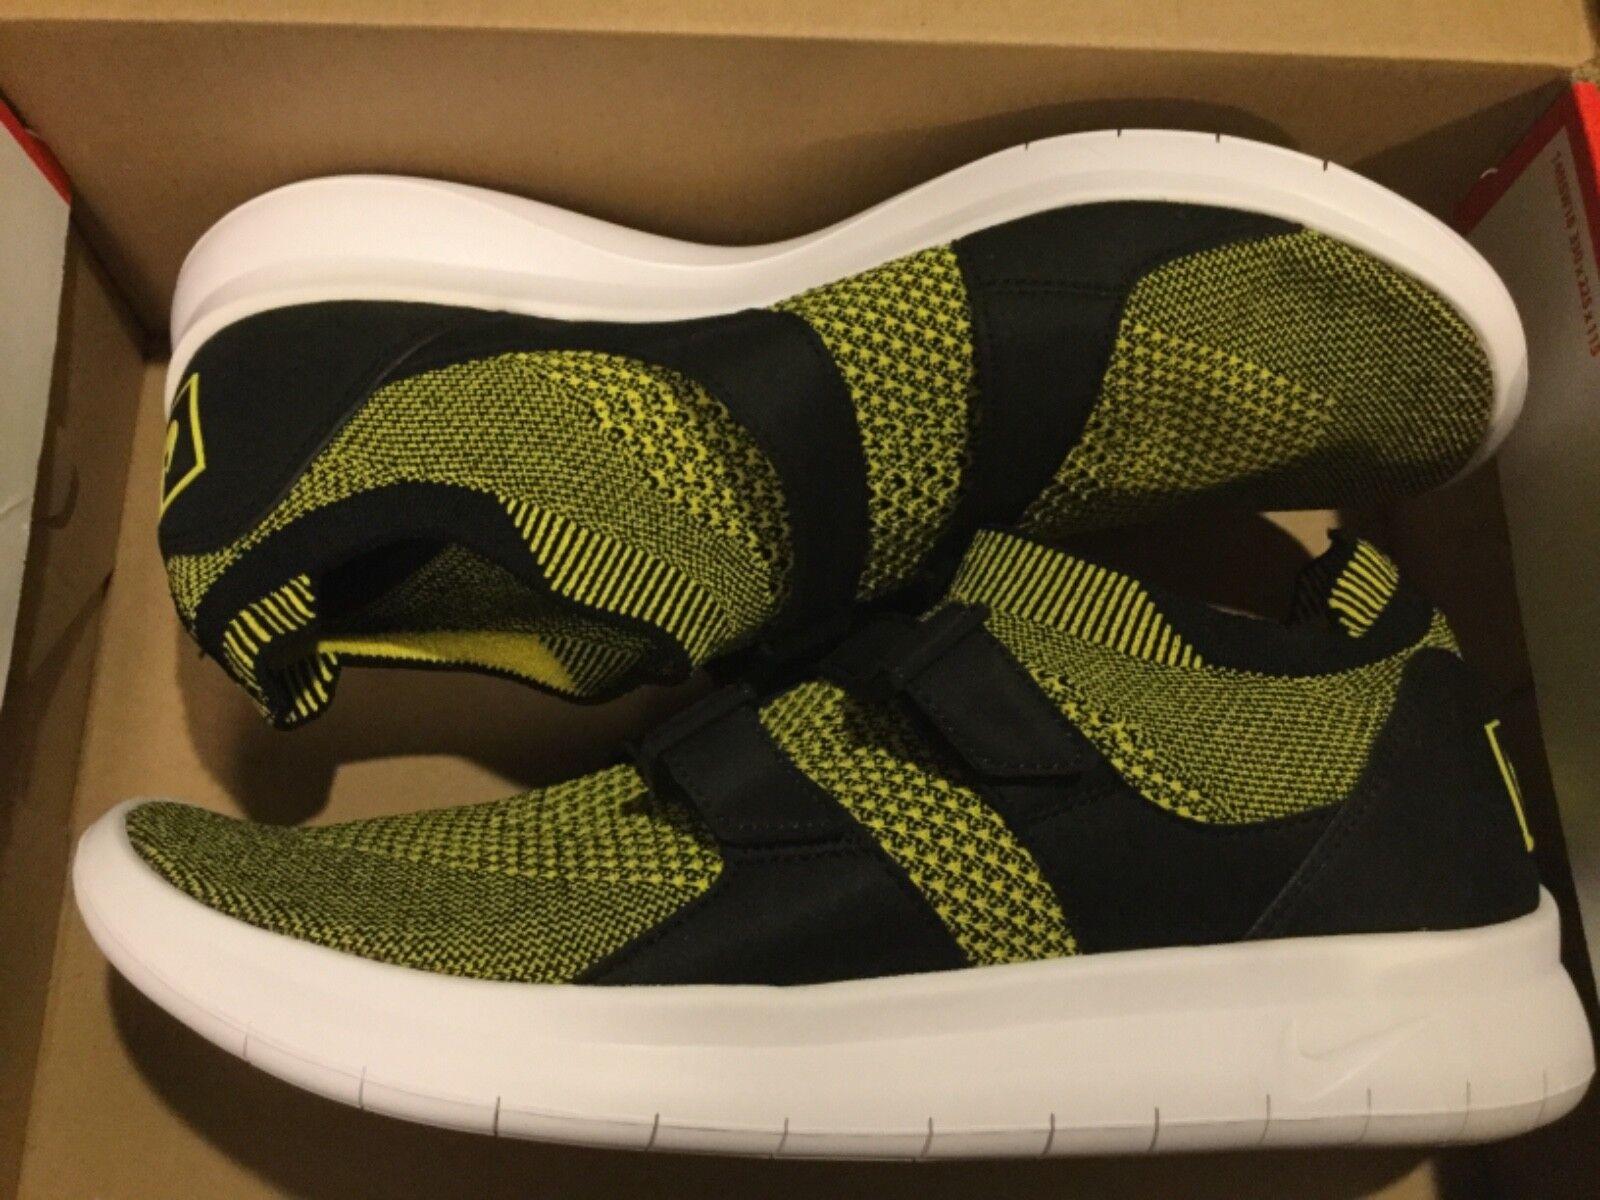 New Shoes Nike Mens Air Sockracer Flyknit Run Running Shoes New 898022-700  sz 10.5 055de9